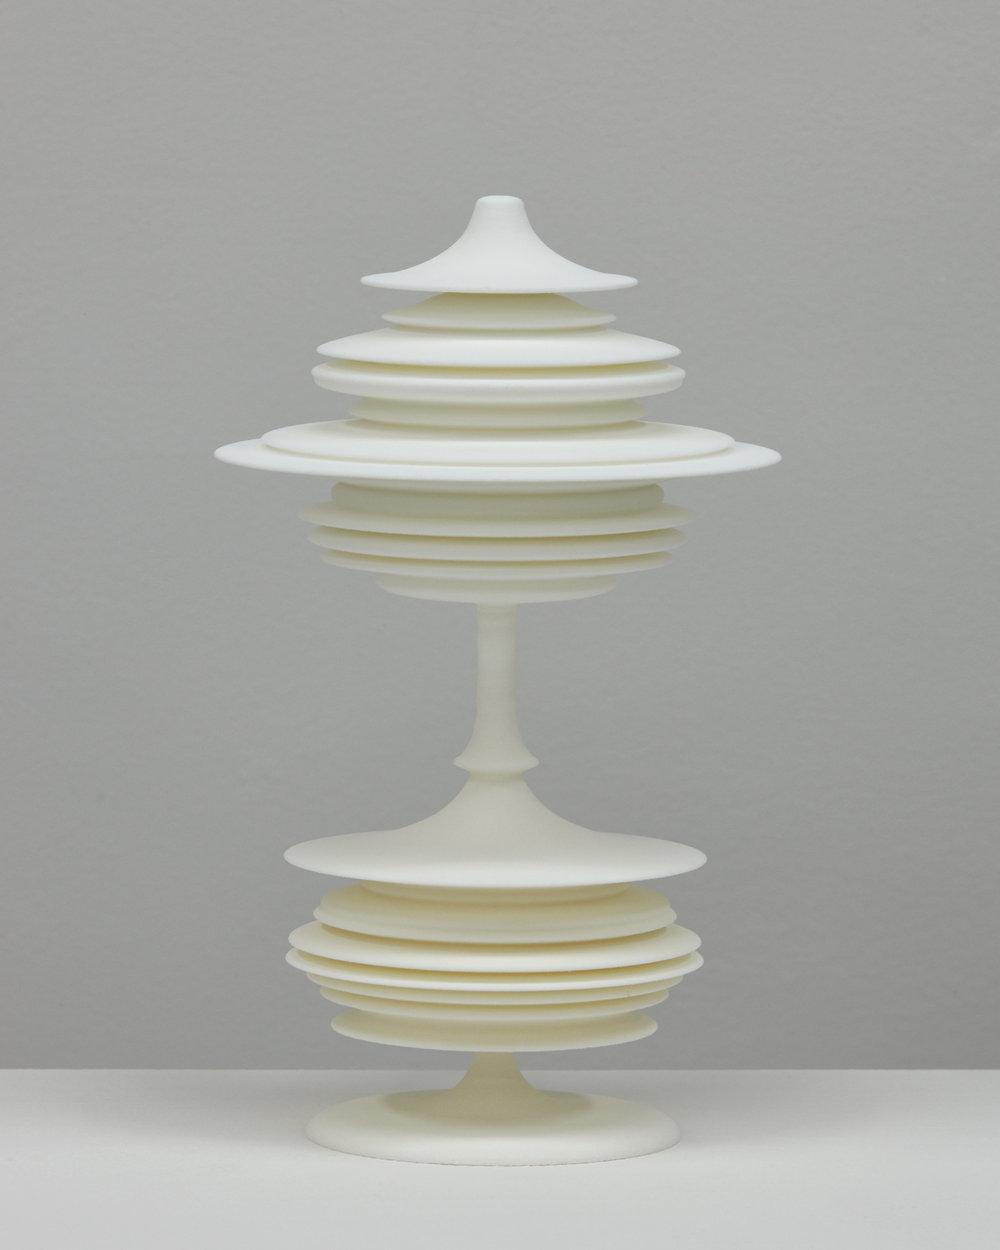 "Laura Splan, ""Manifest (Blink Twice),"" 2015, Laser sintered polyamide nylon, 8 x 4.75 x 4.75 inches, edition of 5 plus one artist proof"